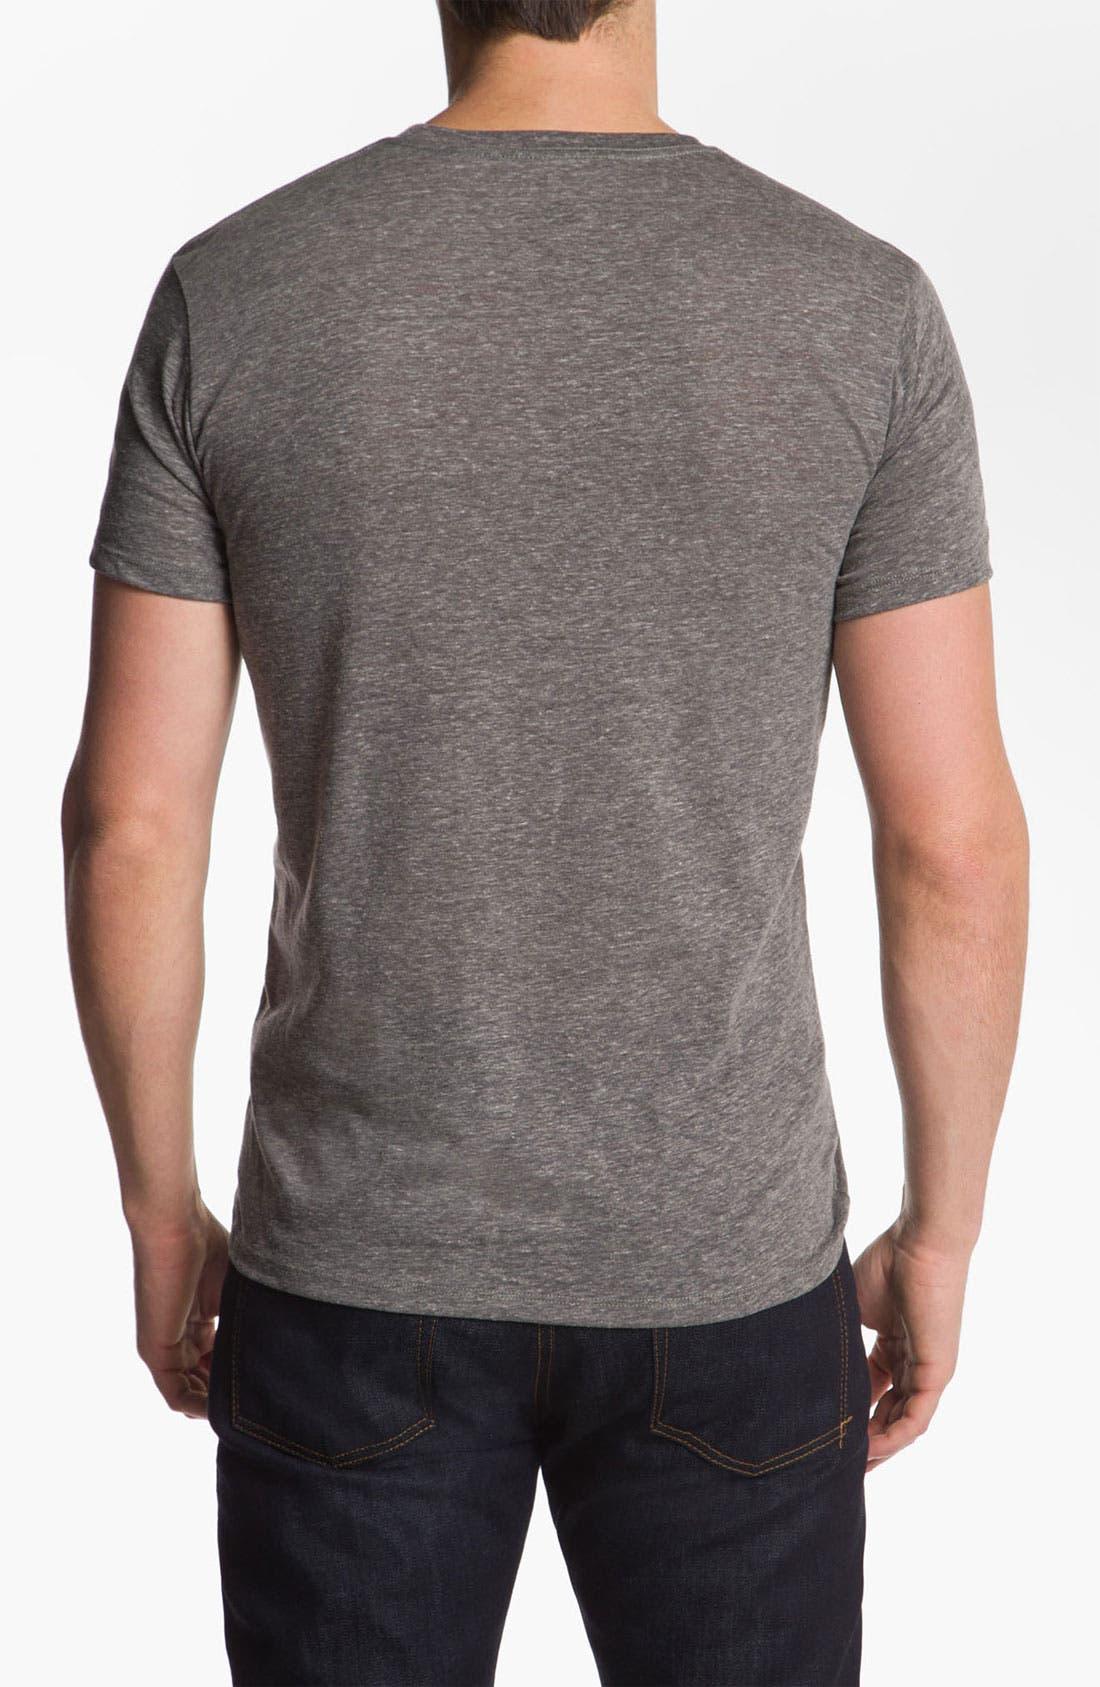 Alternate Image 2  - Headline Shirts 'King' Graphic T-Shirt